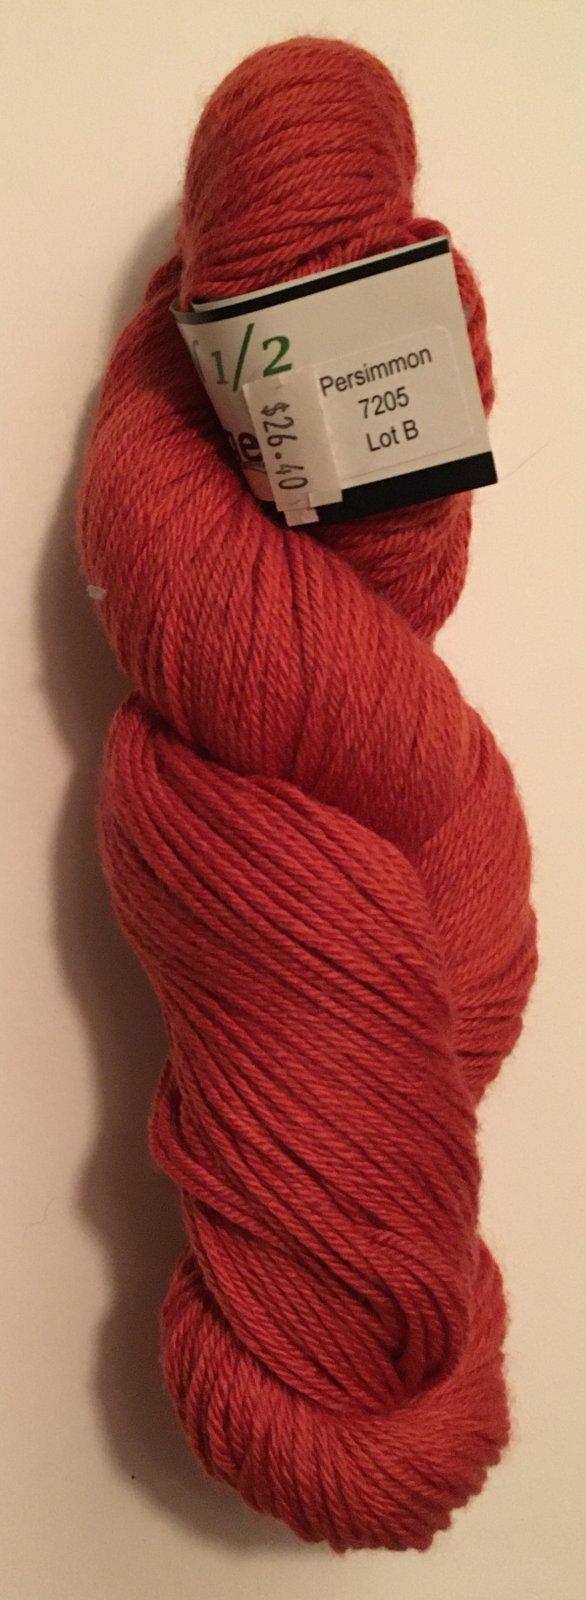 1/2 N 1/2  Flame: Color 7205 Dye Lot B